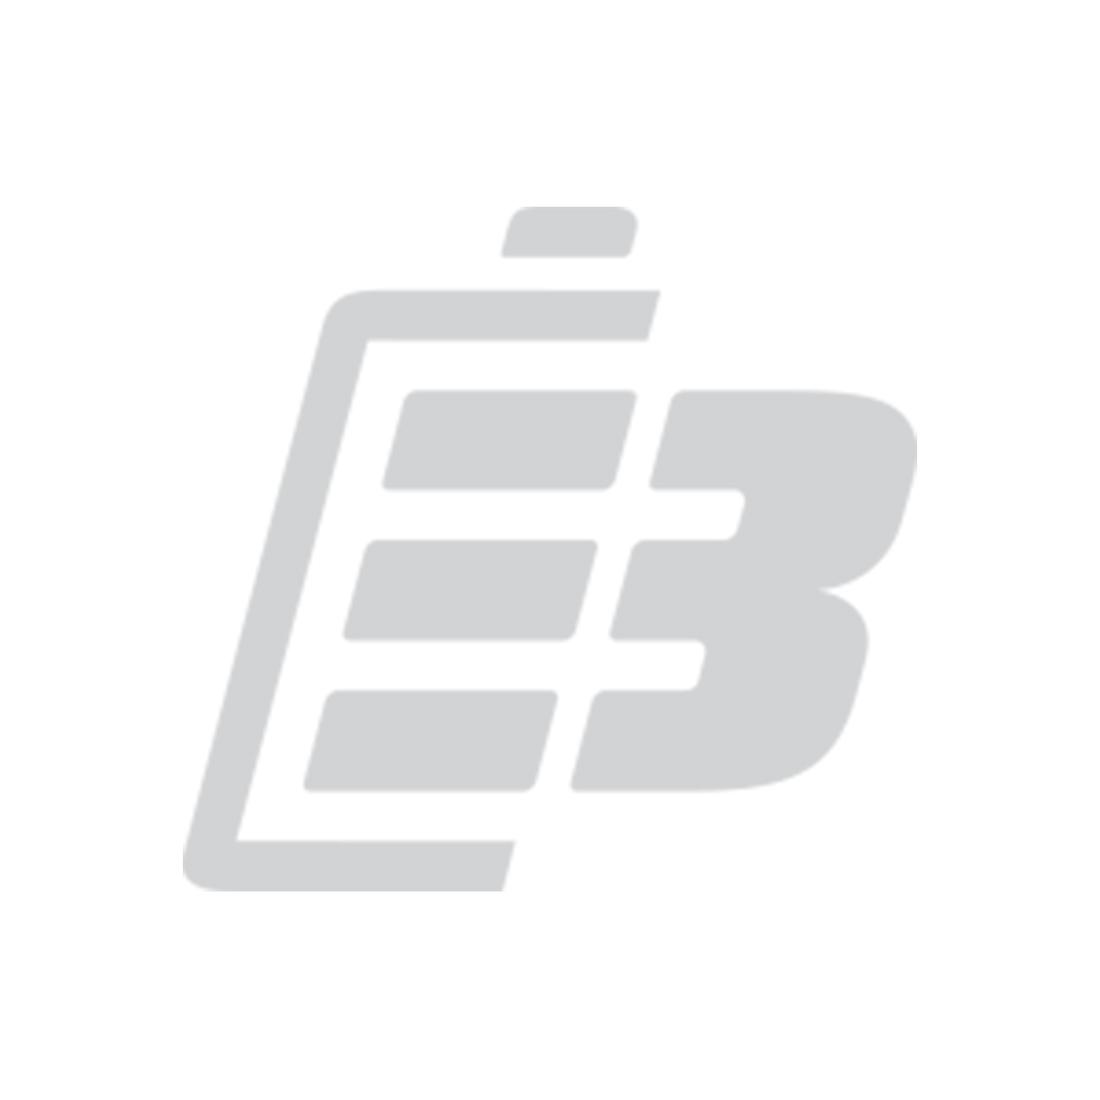 Warrior Mini 2 EDC Tactical Light